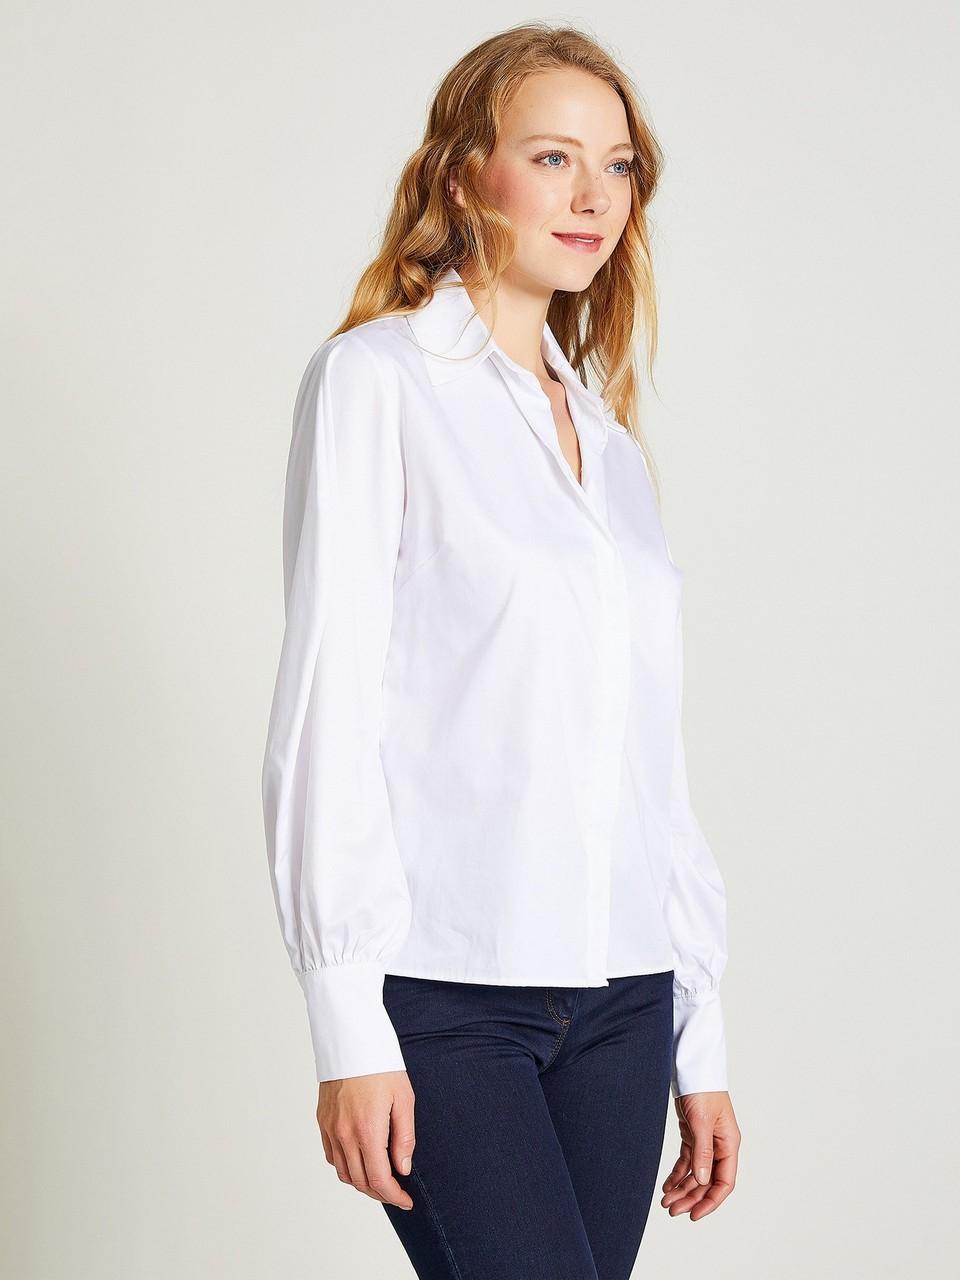 Neckband Wide Cuff Shirt